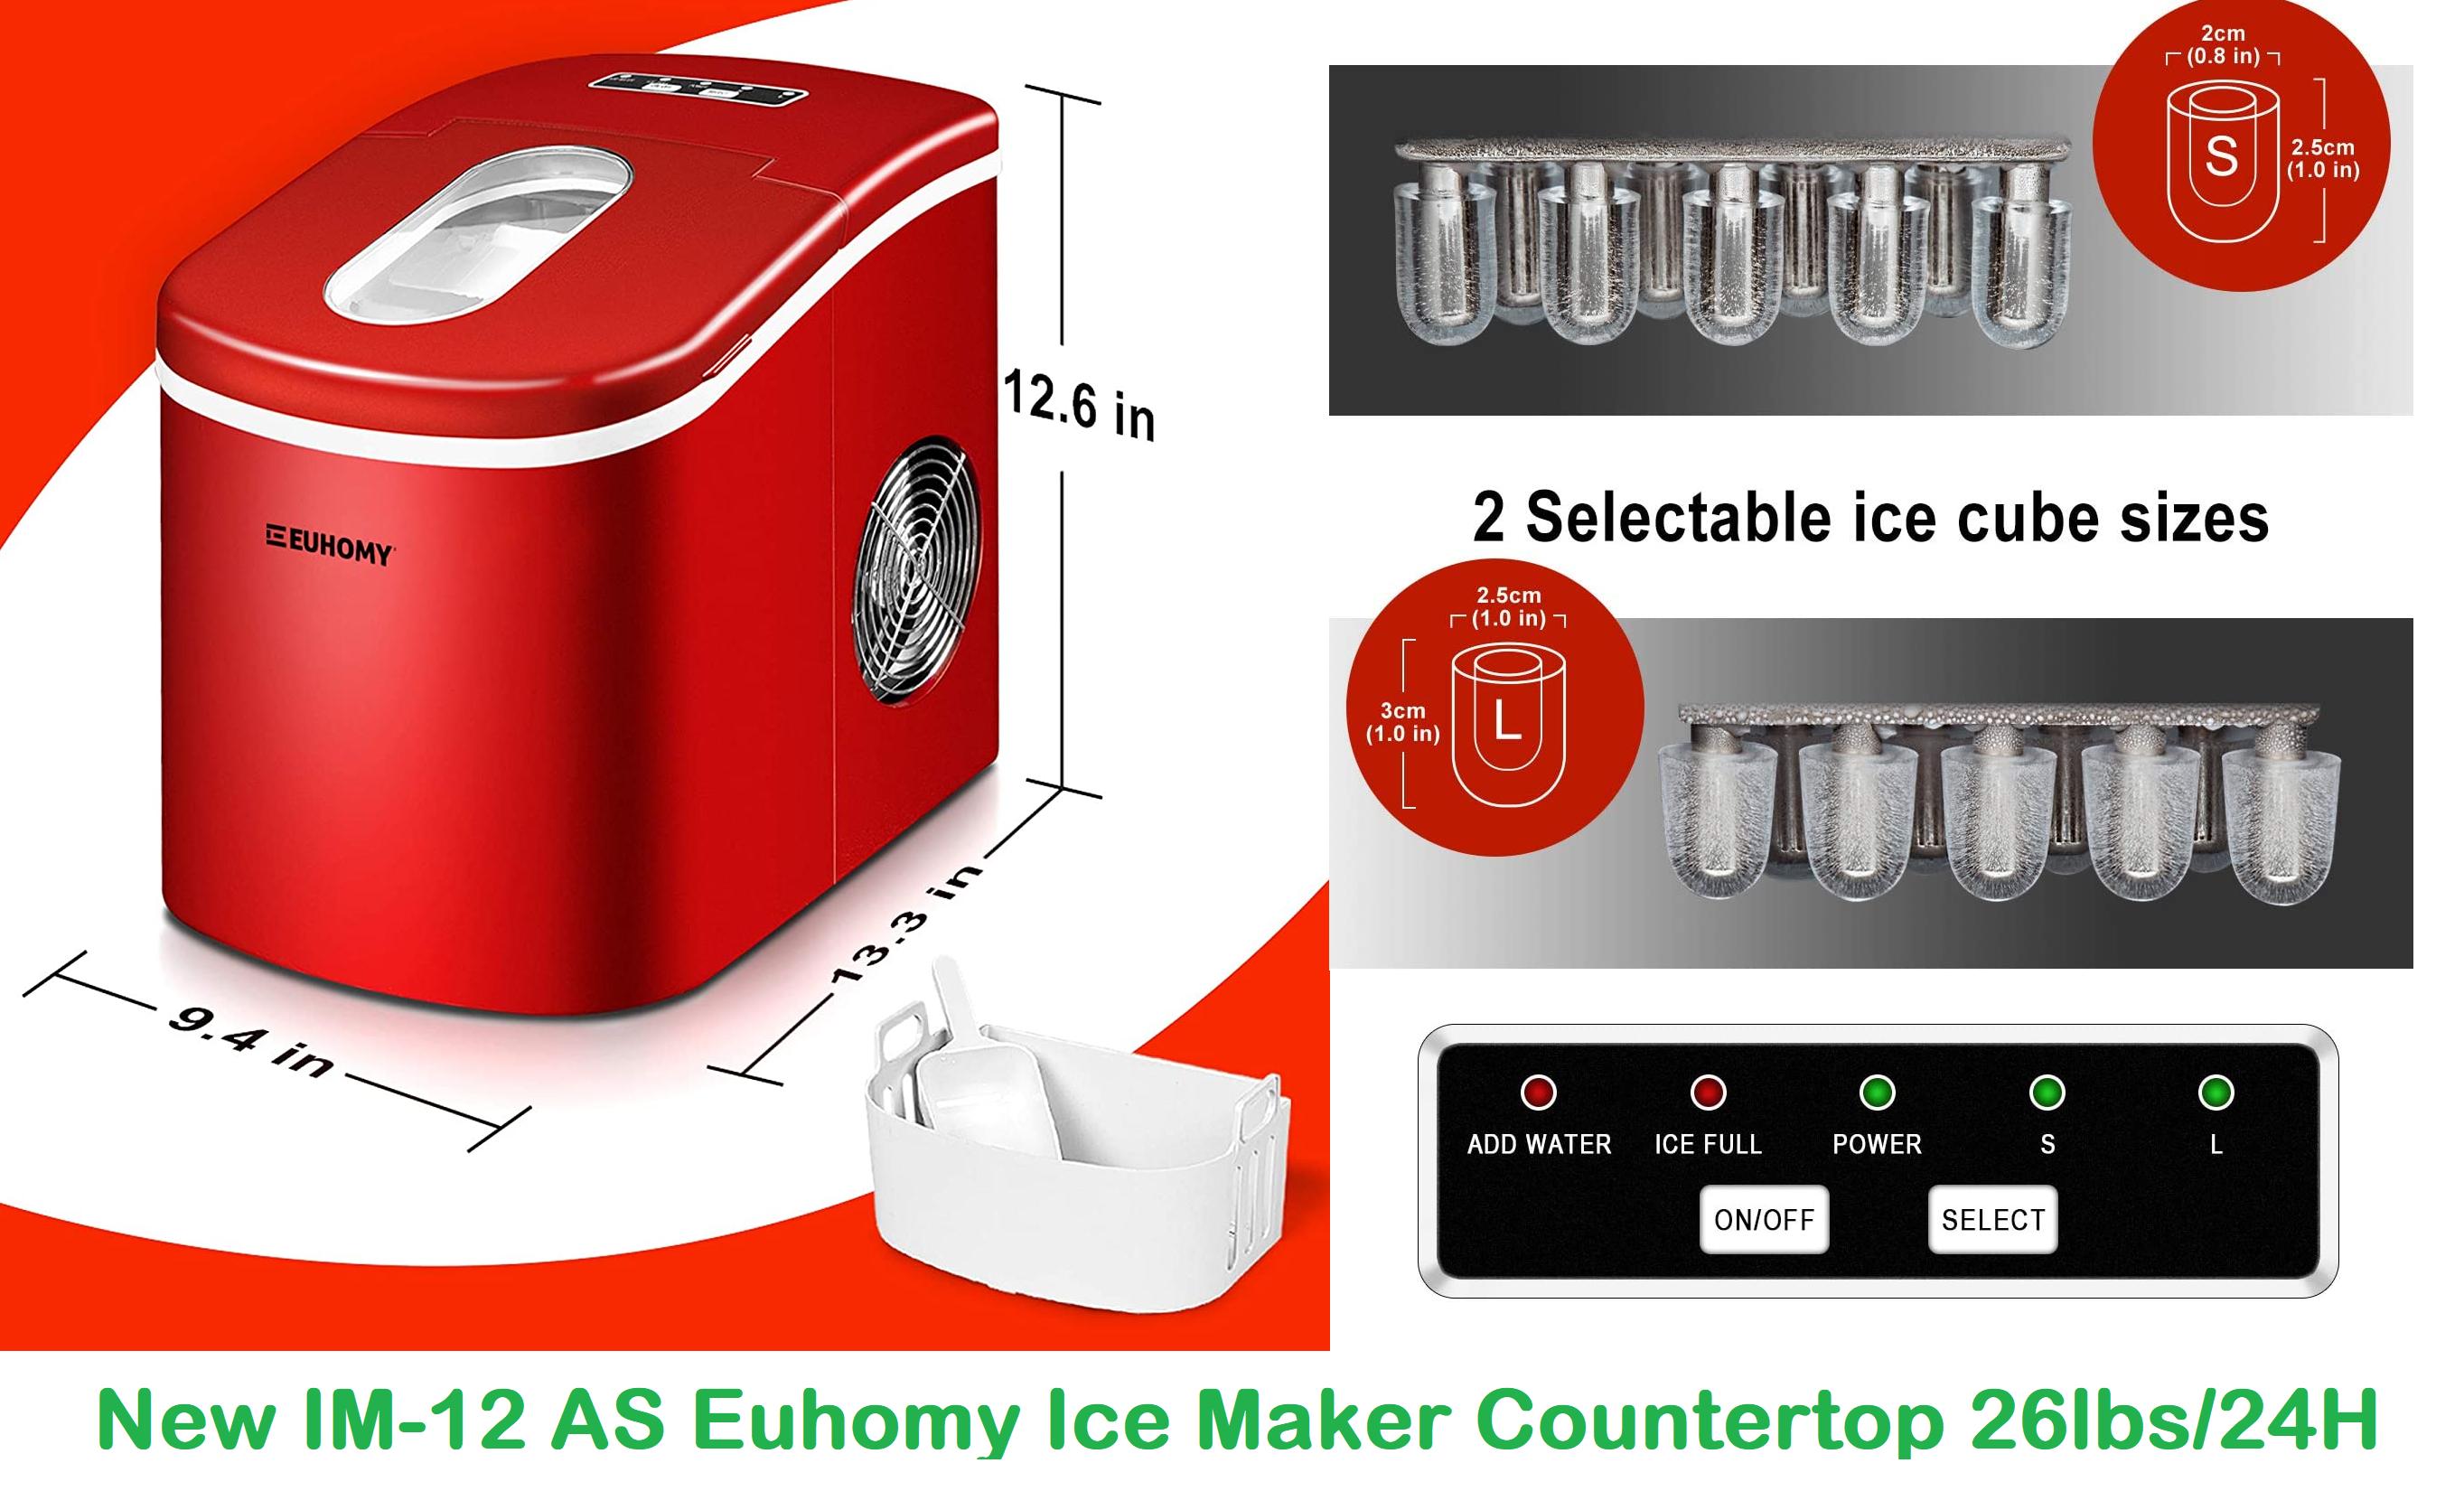 New Euhomy Ice Maker Countertop  26lbs/24H: Portable IM-12 AS